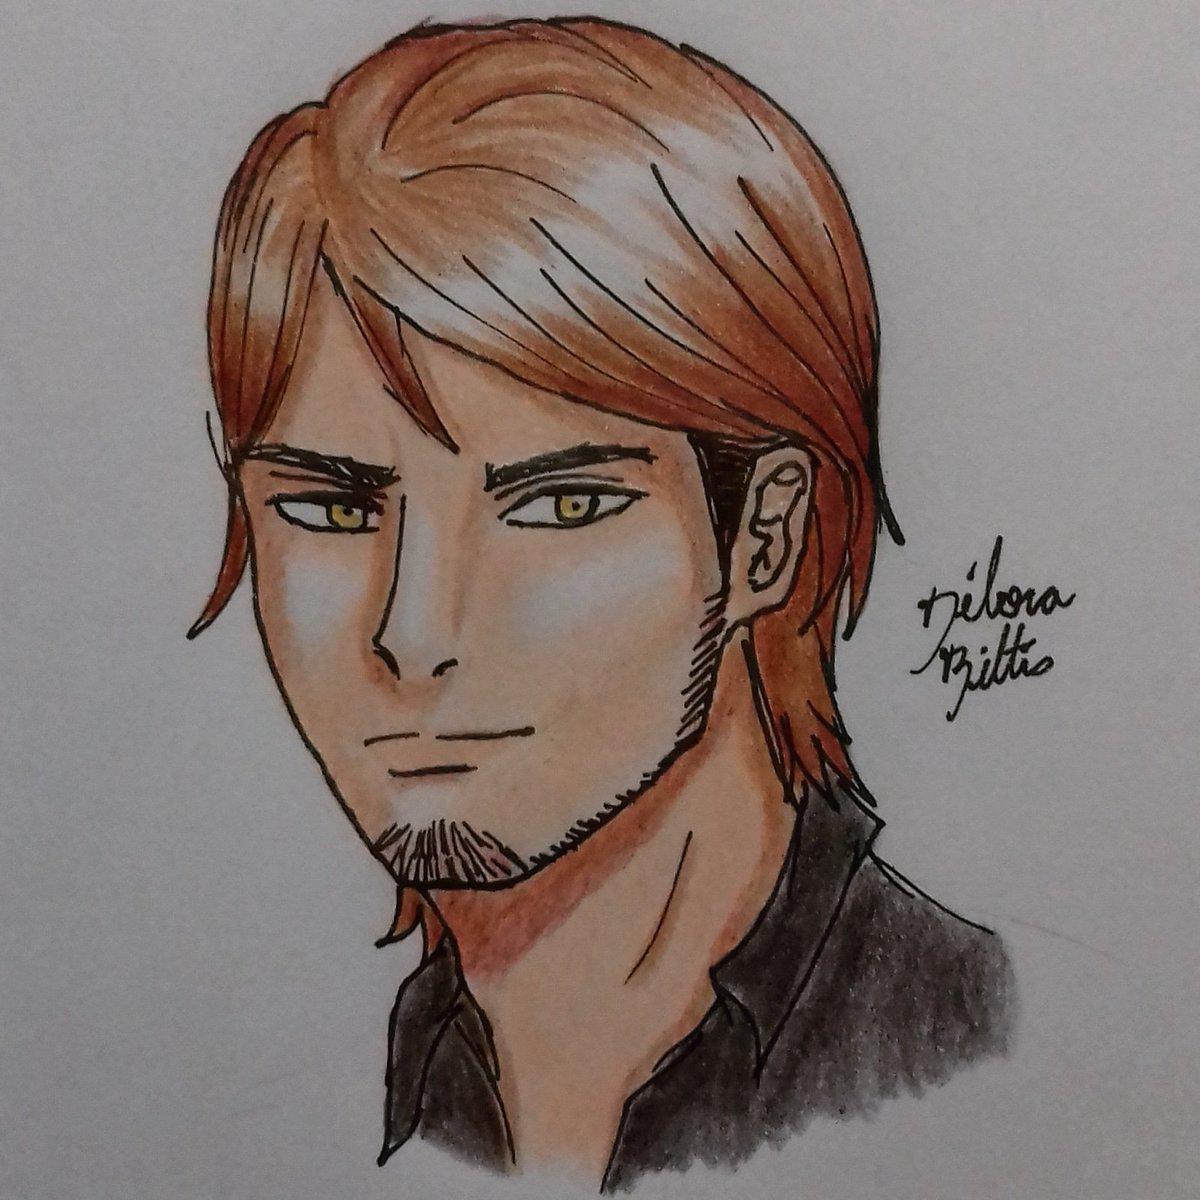 Jean ❤ - SHINGEKI NO KYOJIN.  #FANART #shingekinokyojin #atackontitan #jean #jeankirstein  #eren #mikasa #art #draw #drawing #desenhos #artwork